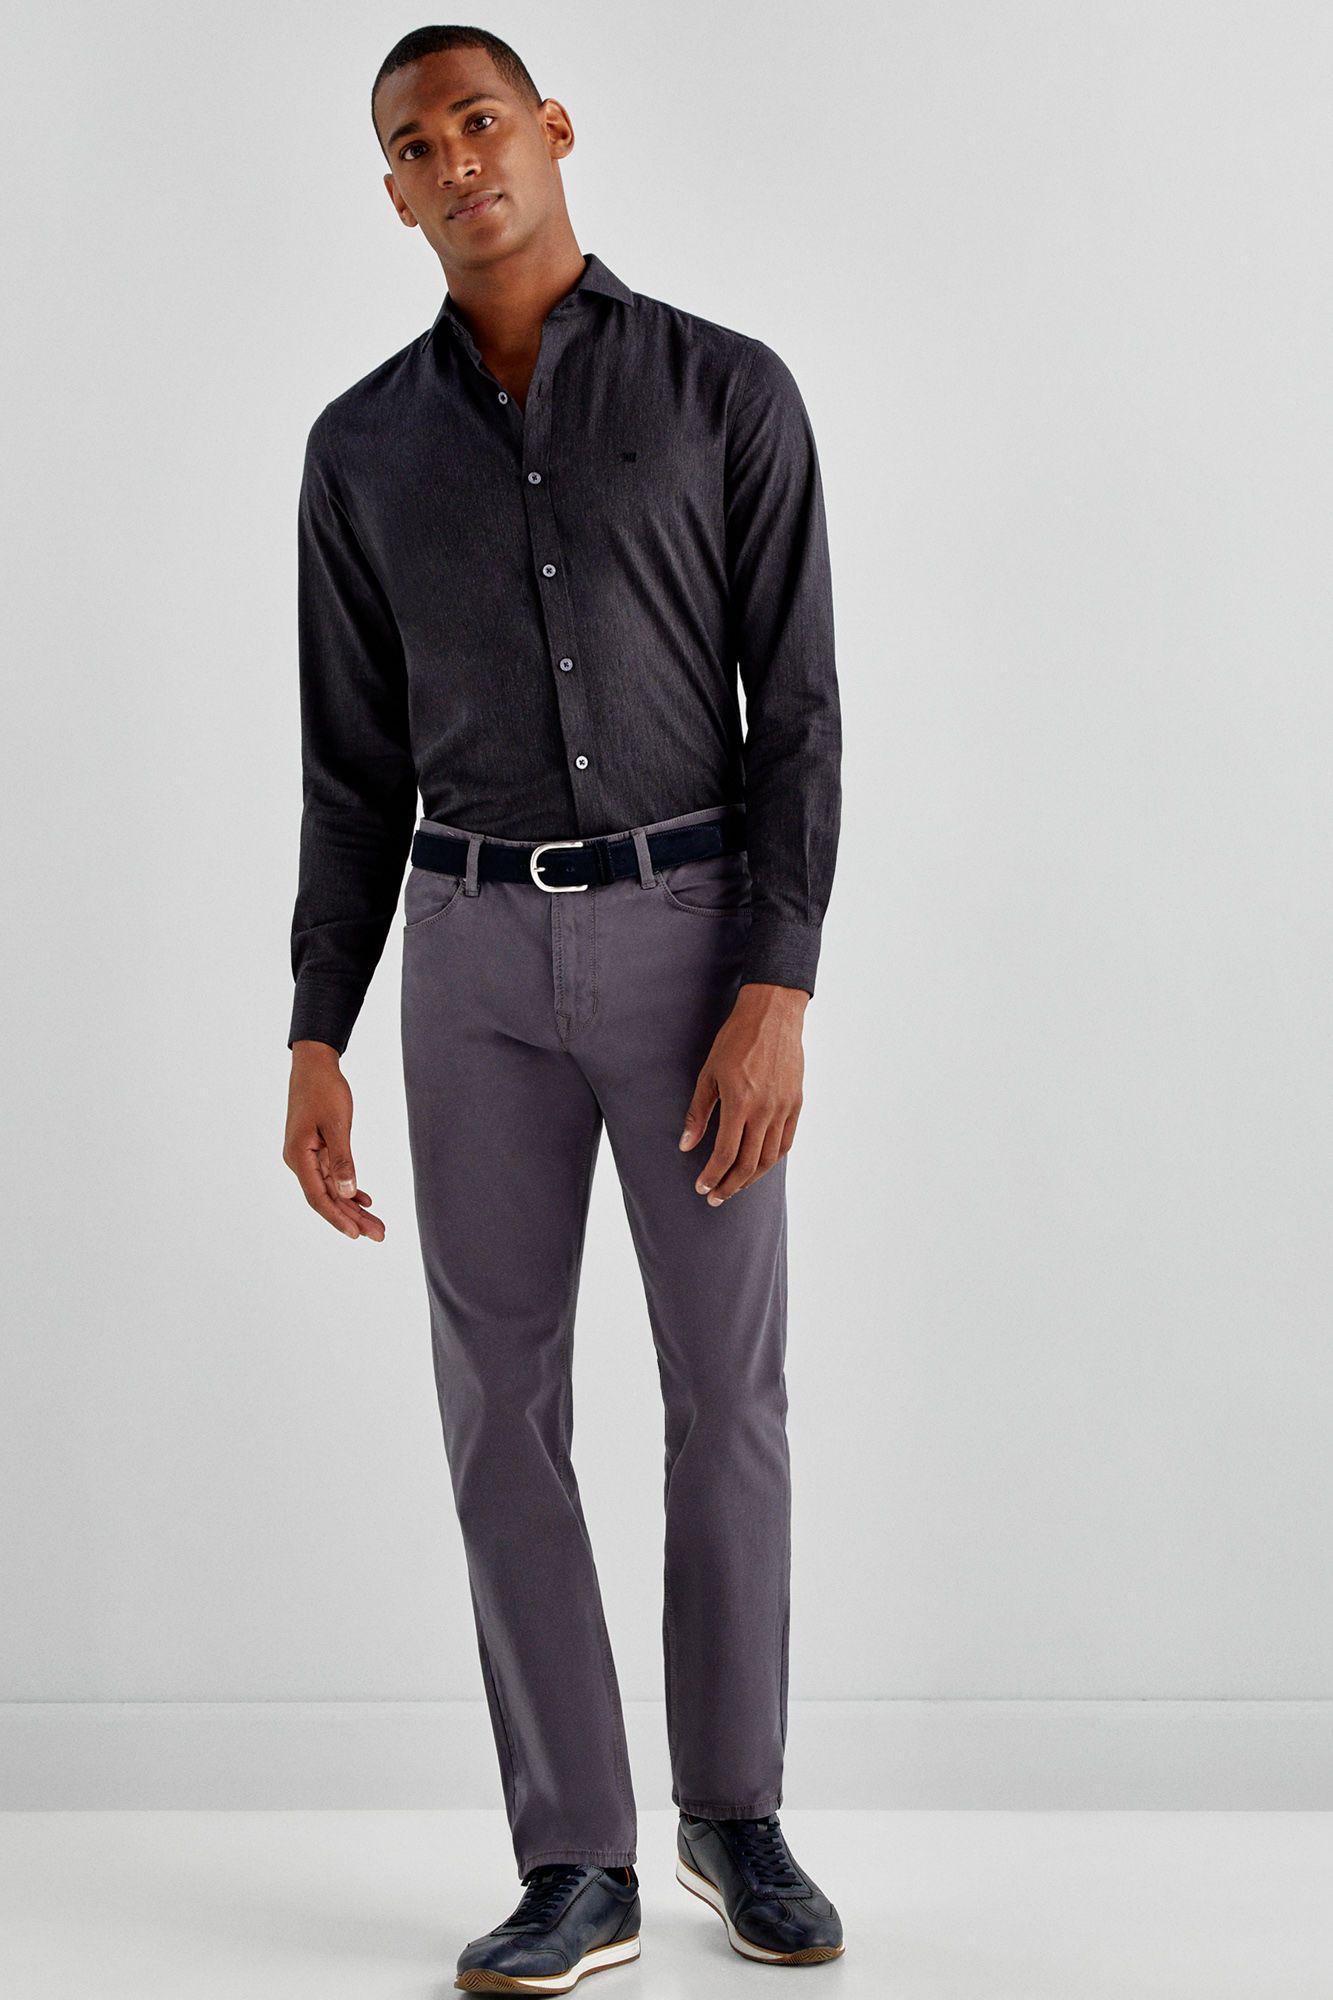 56f3be92c5 Pantalón cinco bolsillos premium flex slim fit